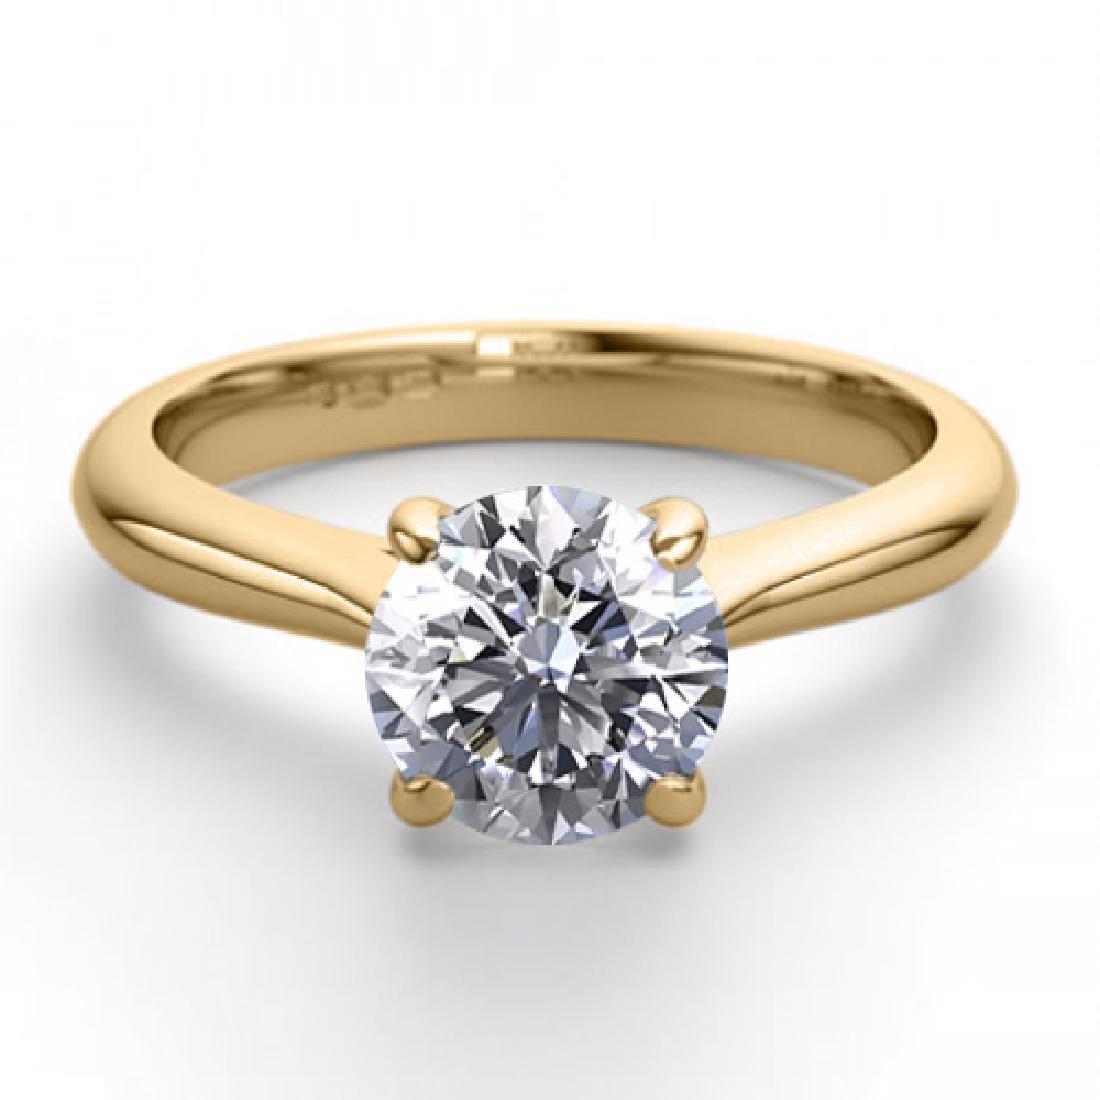 14K Yellow Gold Jewelry 0.91 ctw Natural Diamond